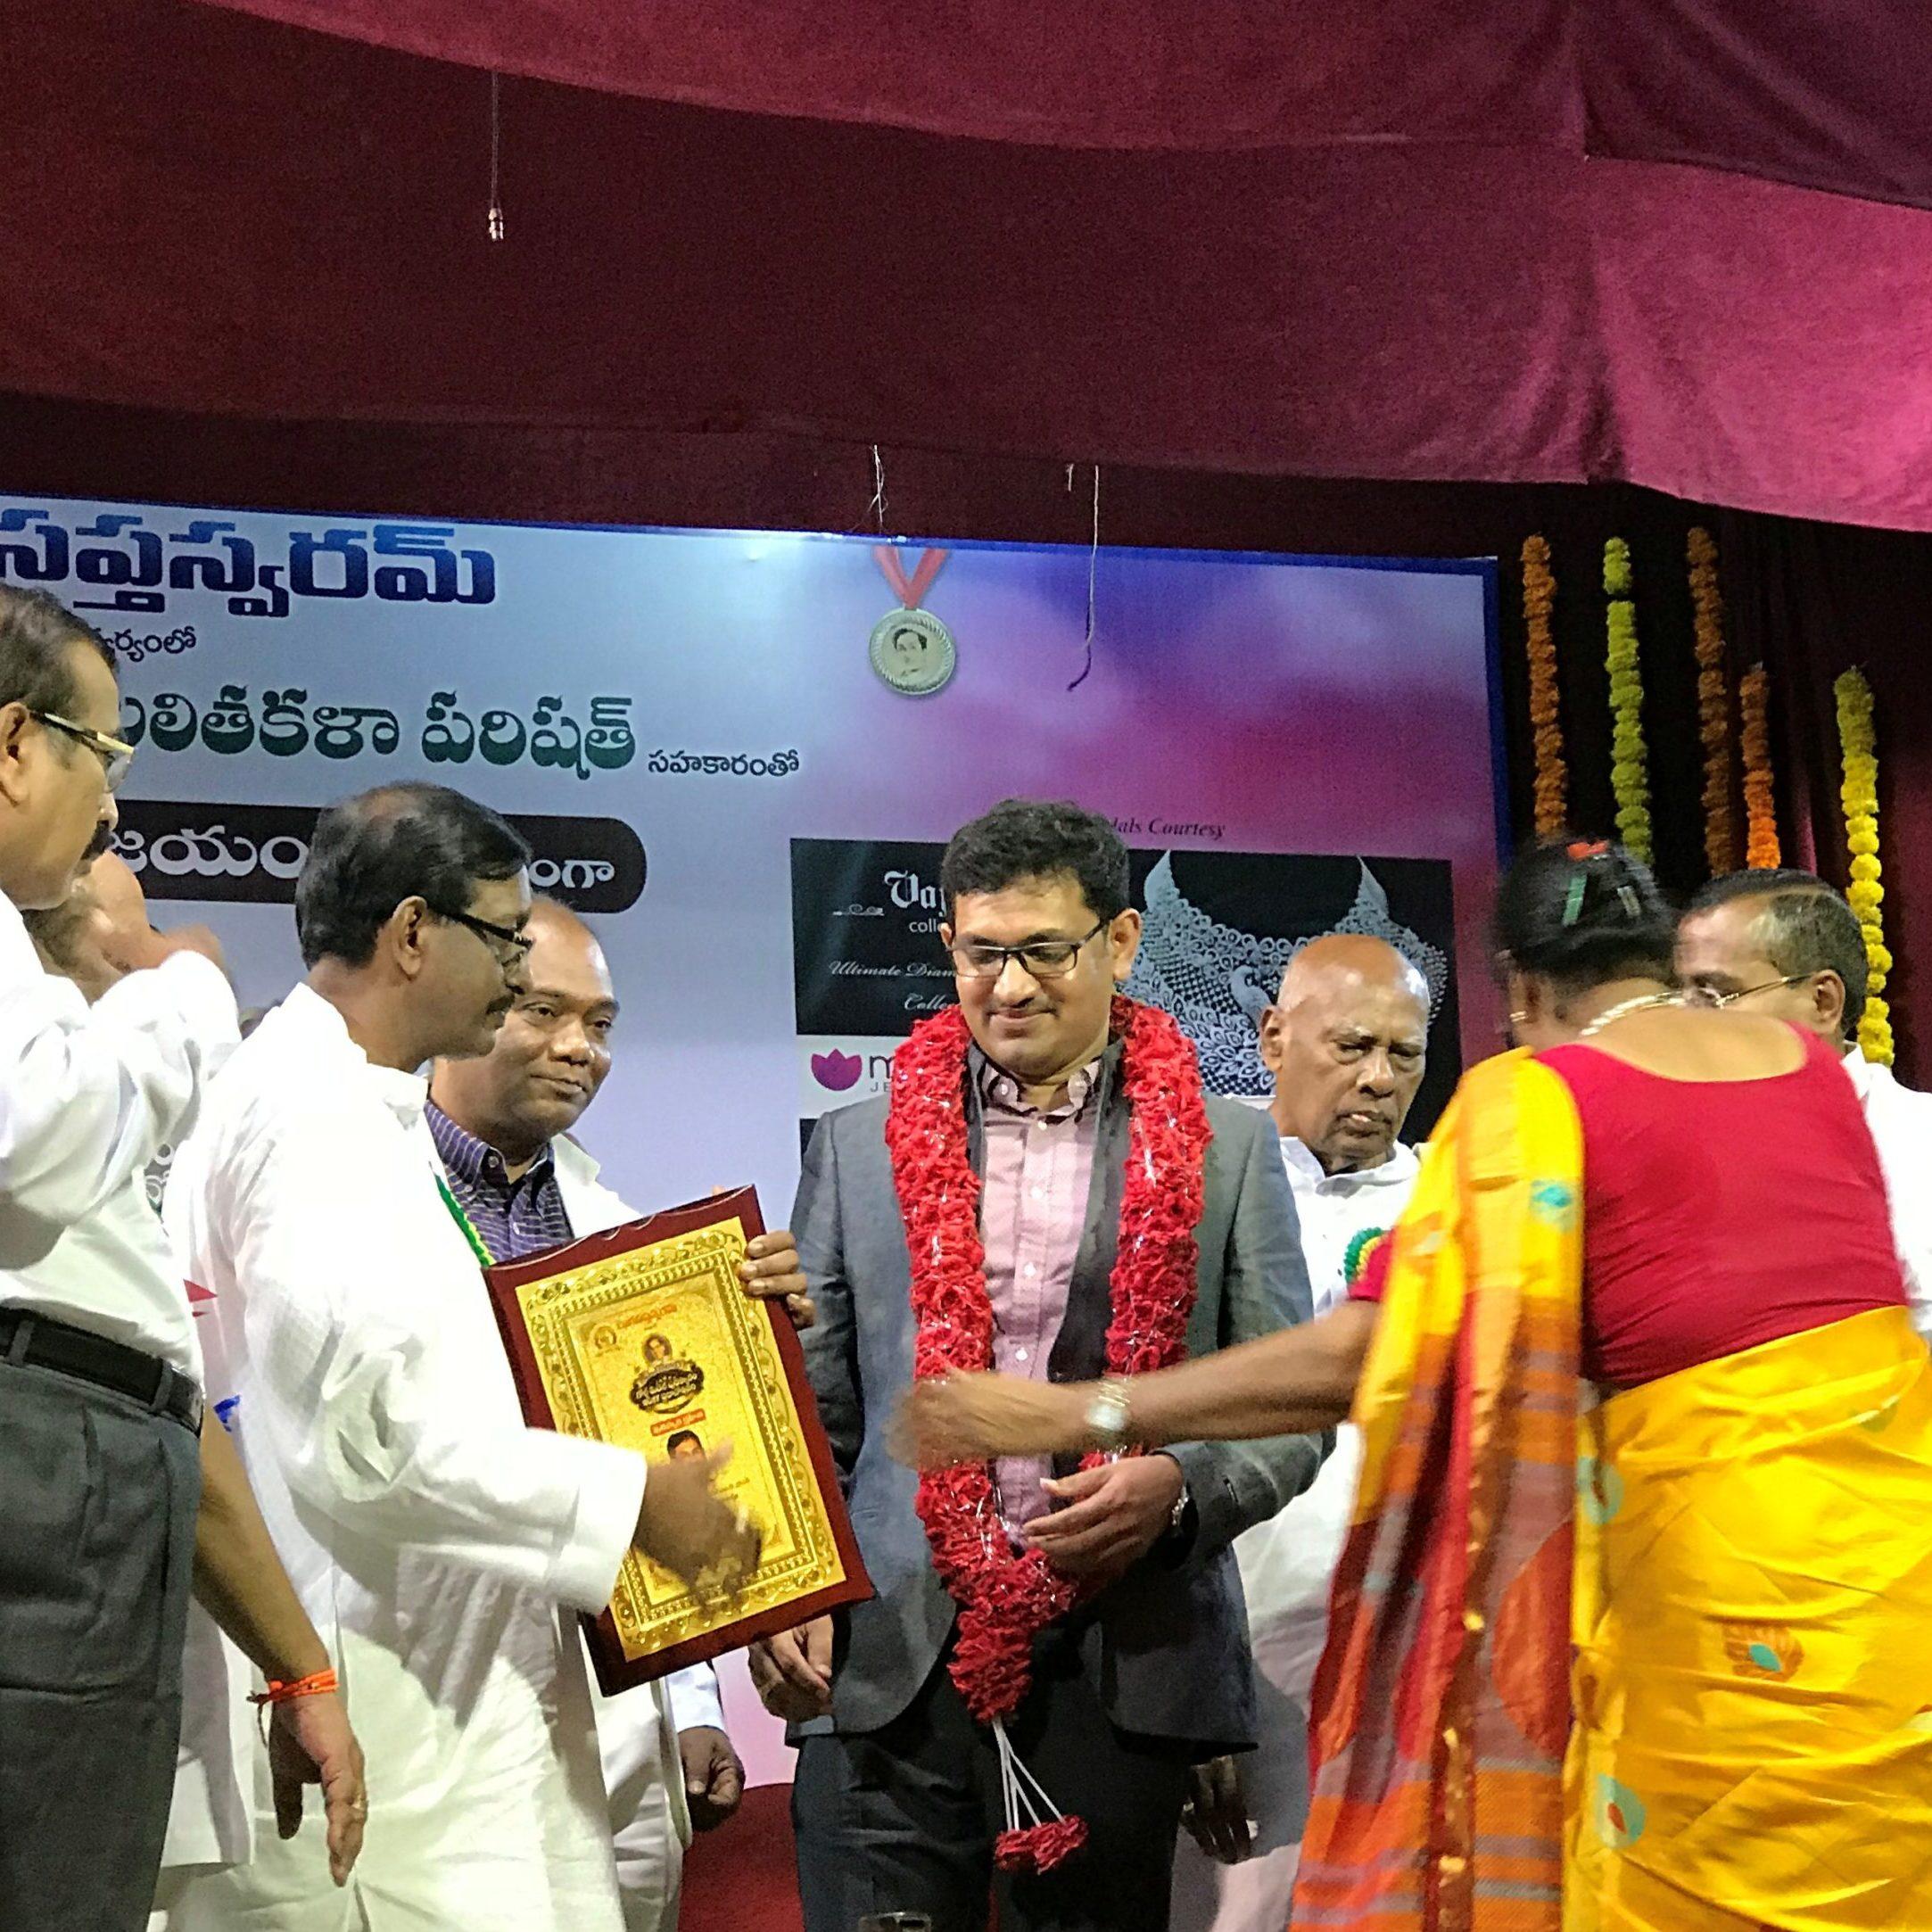 award received by Dr Chandrashekhar